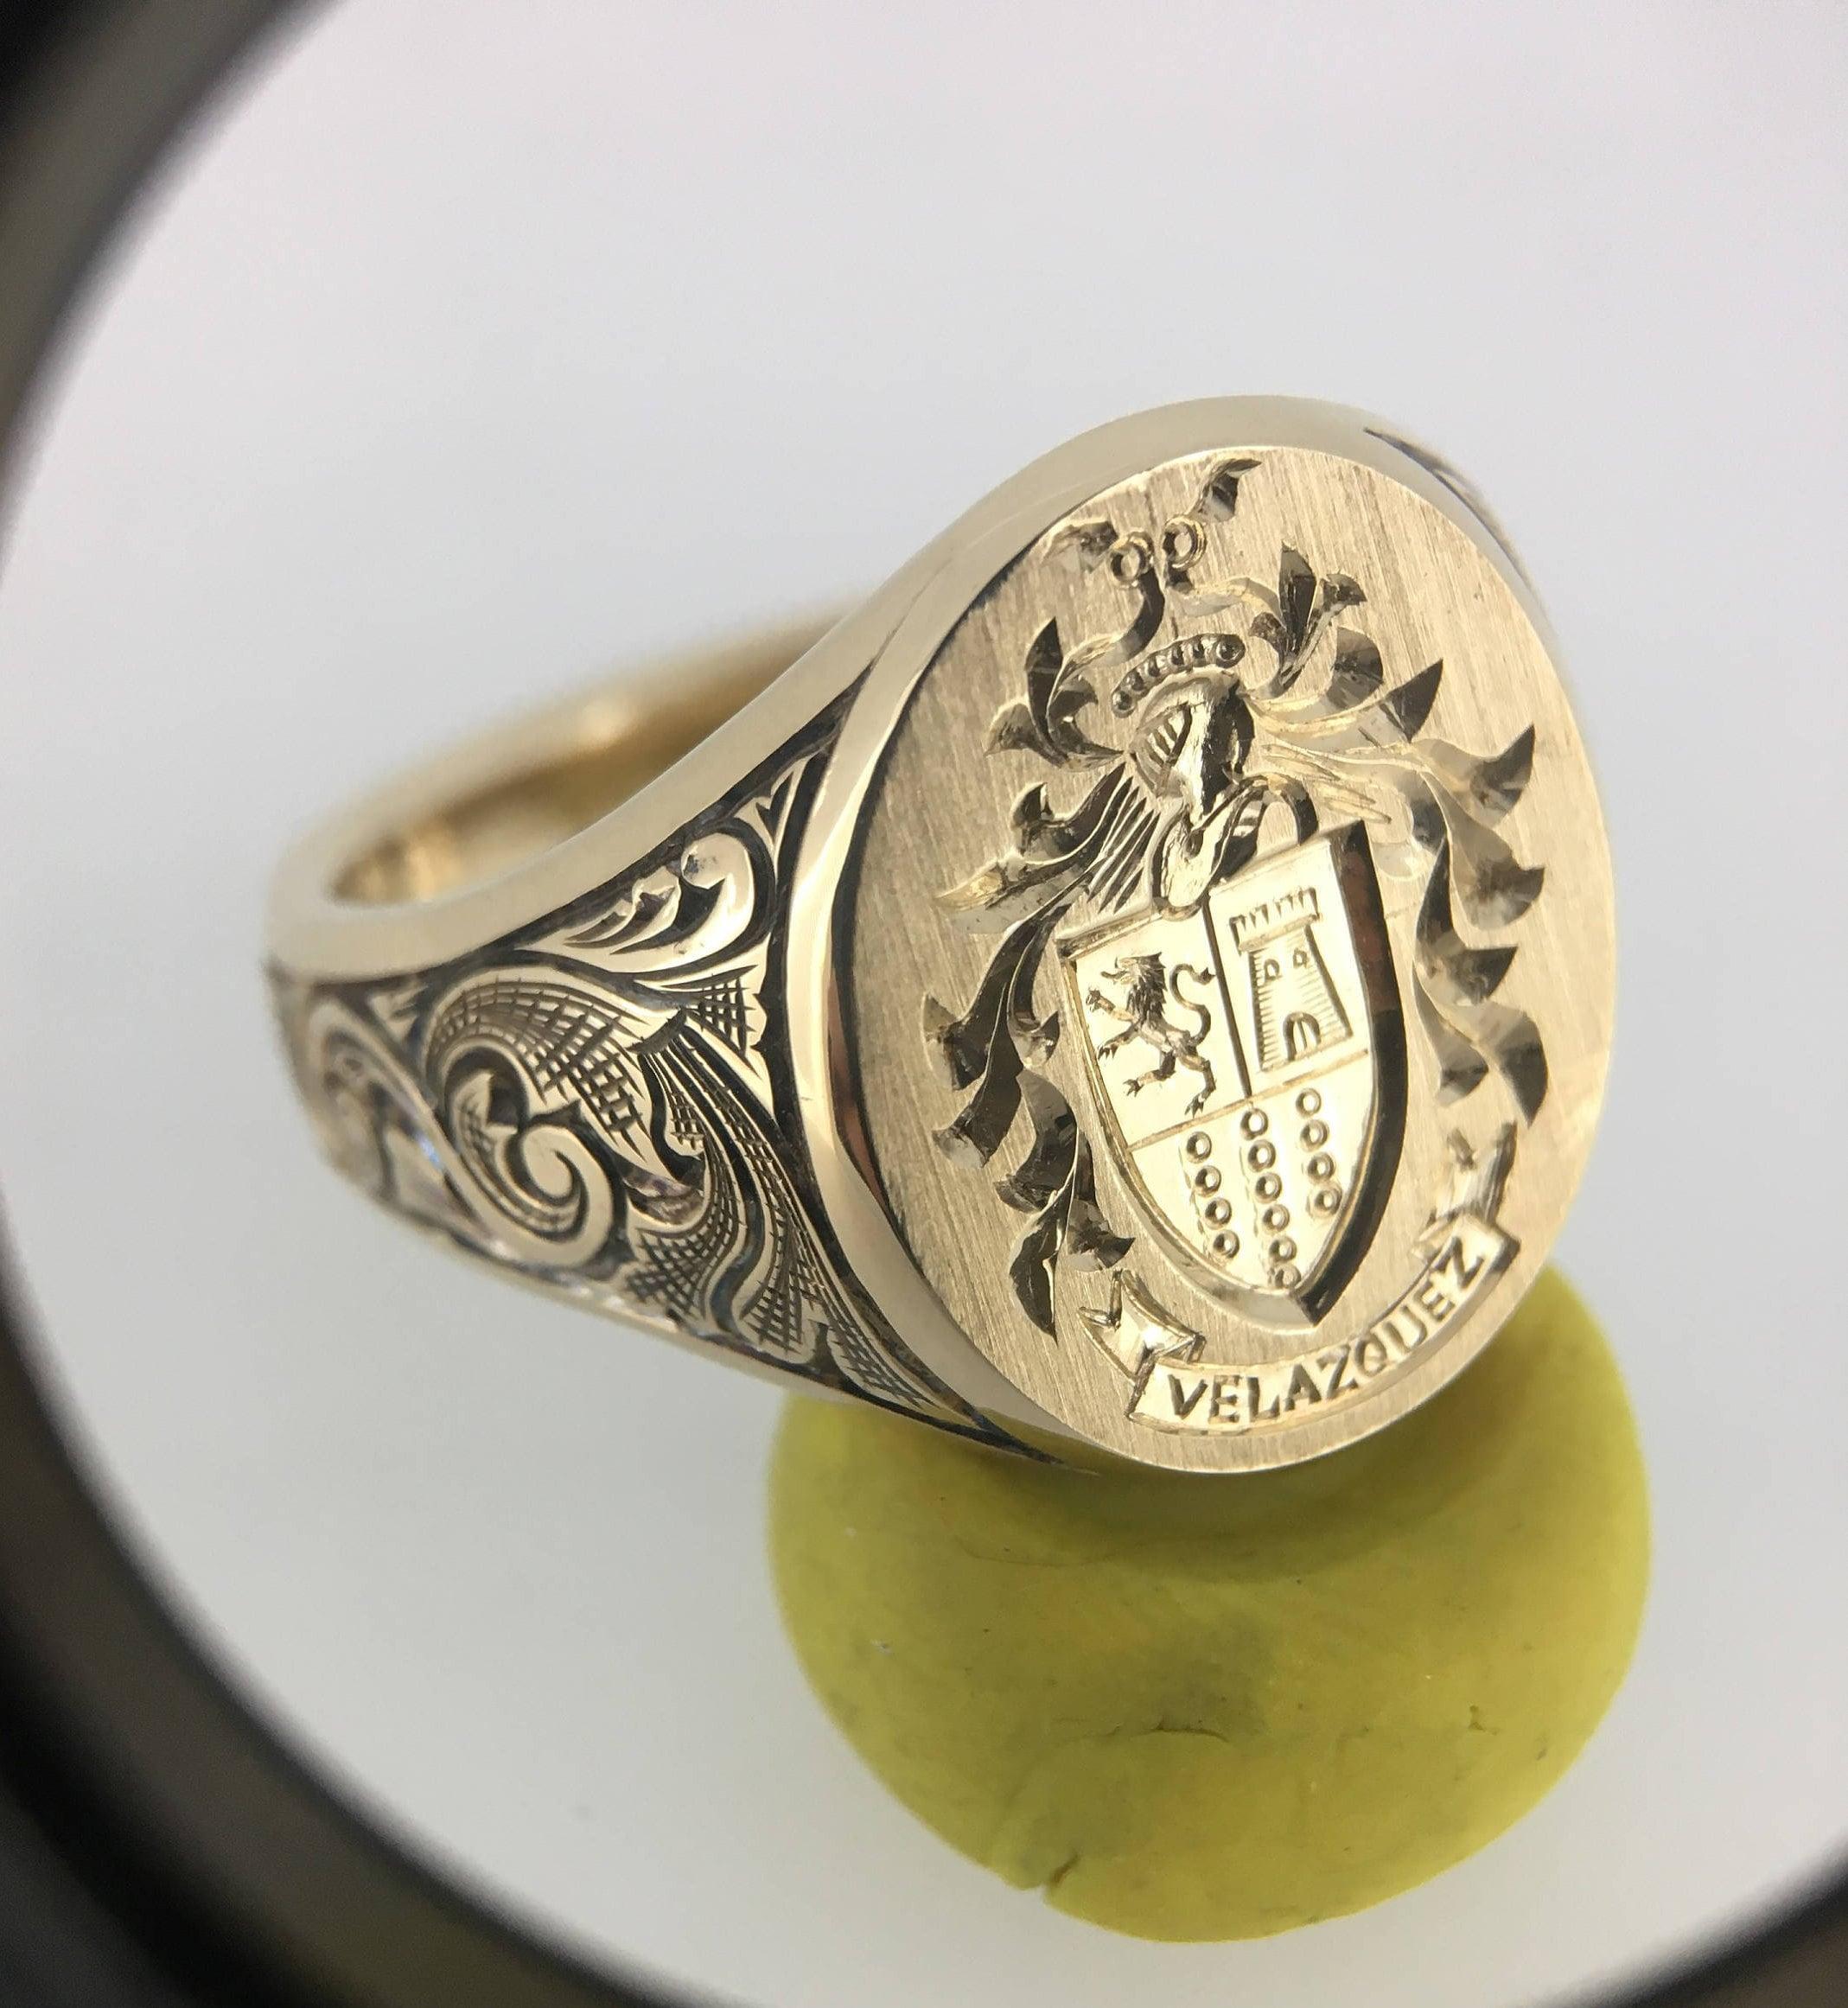 2947879ca44d6 Mens Signet Ring, Custom Gold Signet Ring, Coat Of Arms Signet Ring, Family  Crest, Monogram Signet, Unique Mens Ring, Gold Signet Ring, Ring